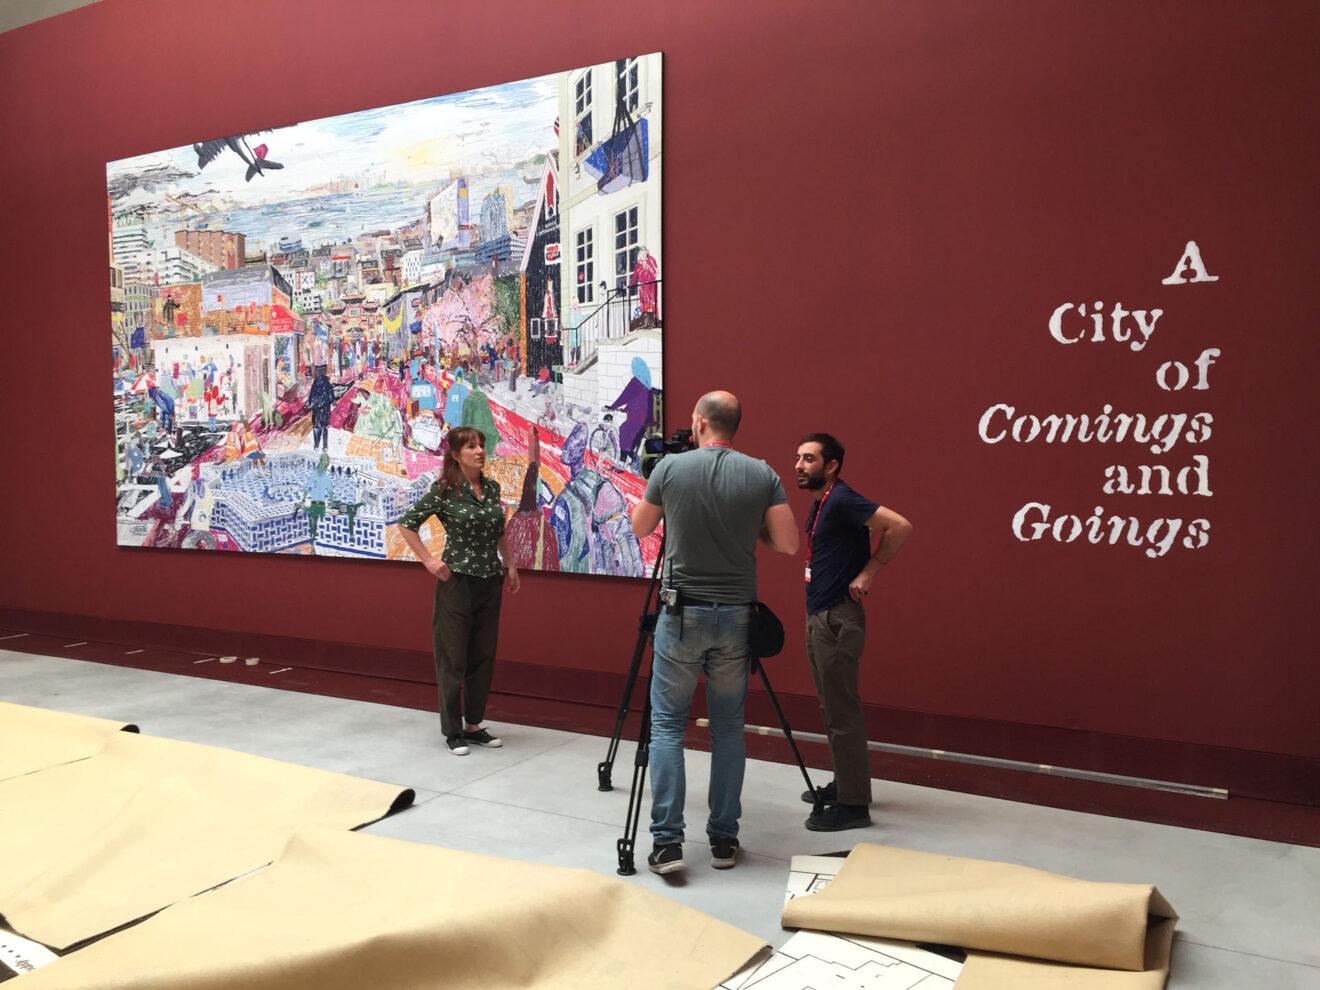 Tentoonstelling 'City of Comings and Goings' op de Biennale di Venezia, 2018